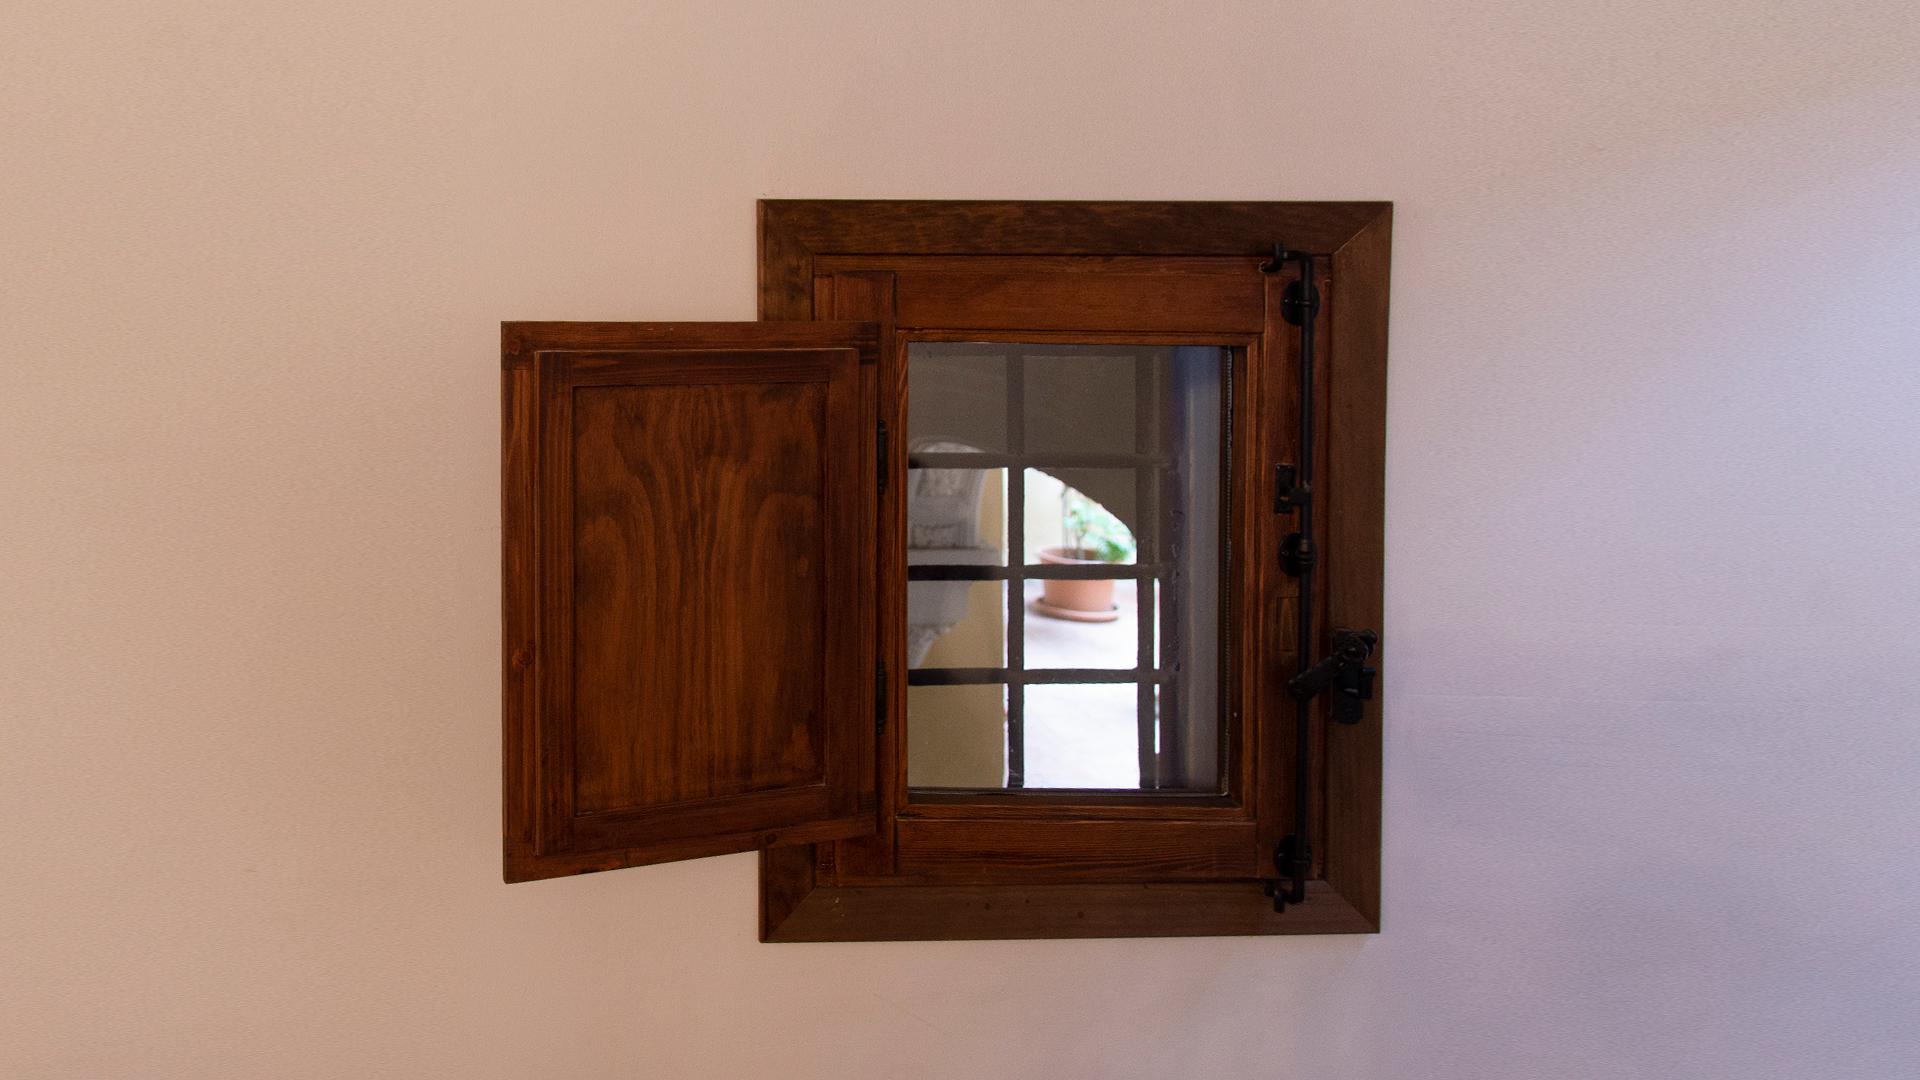 RMCZ despacho donlope 4 ventana zaguan 2